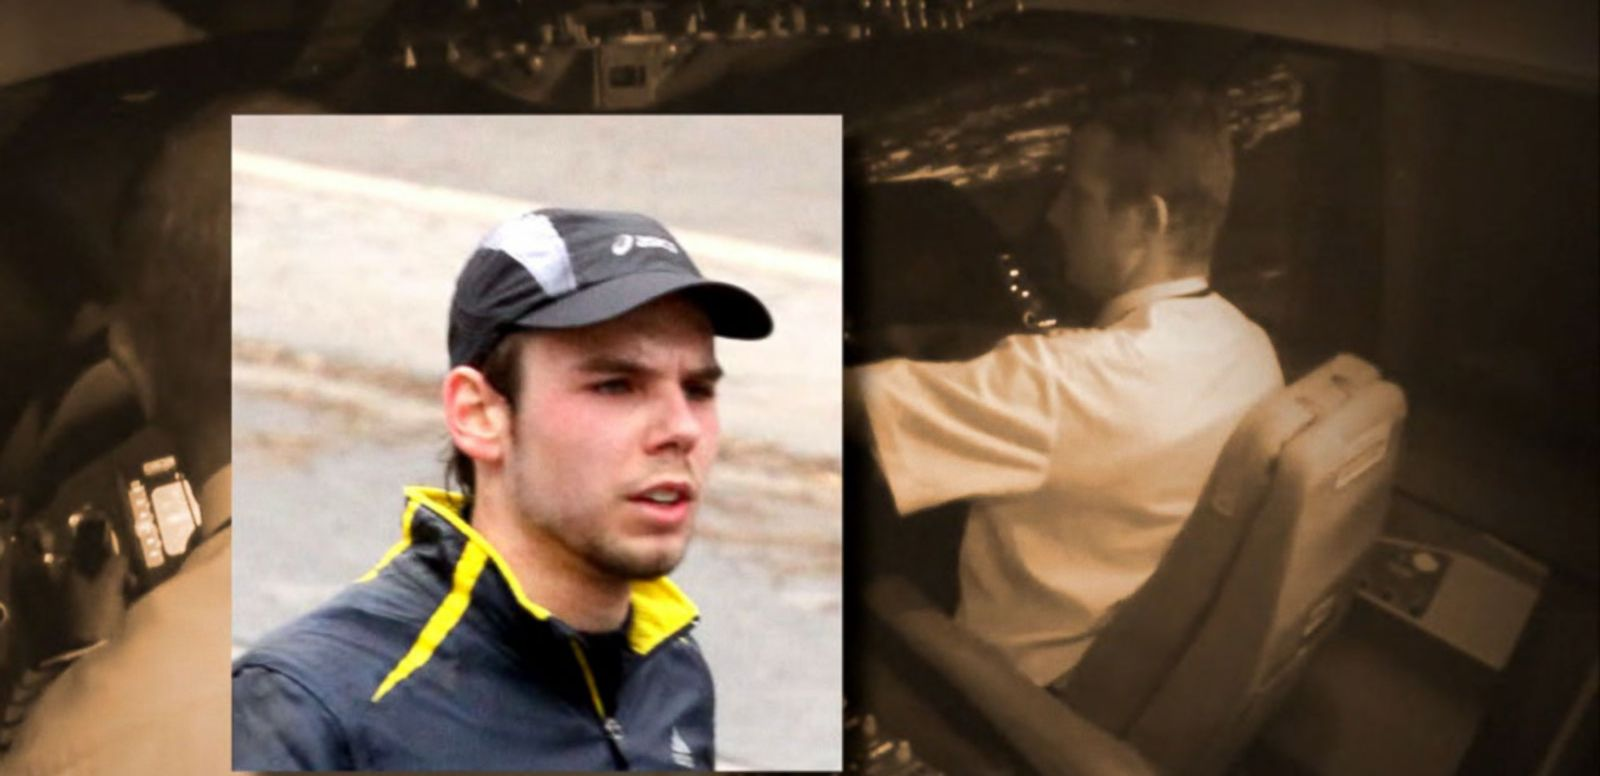 VIDEO: Germanwings Plane Crash Prompts Changes